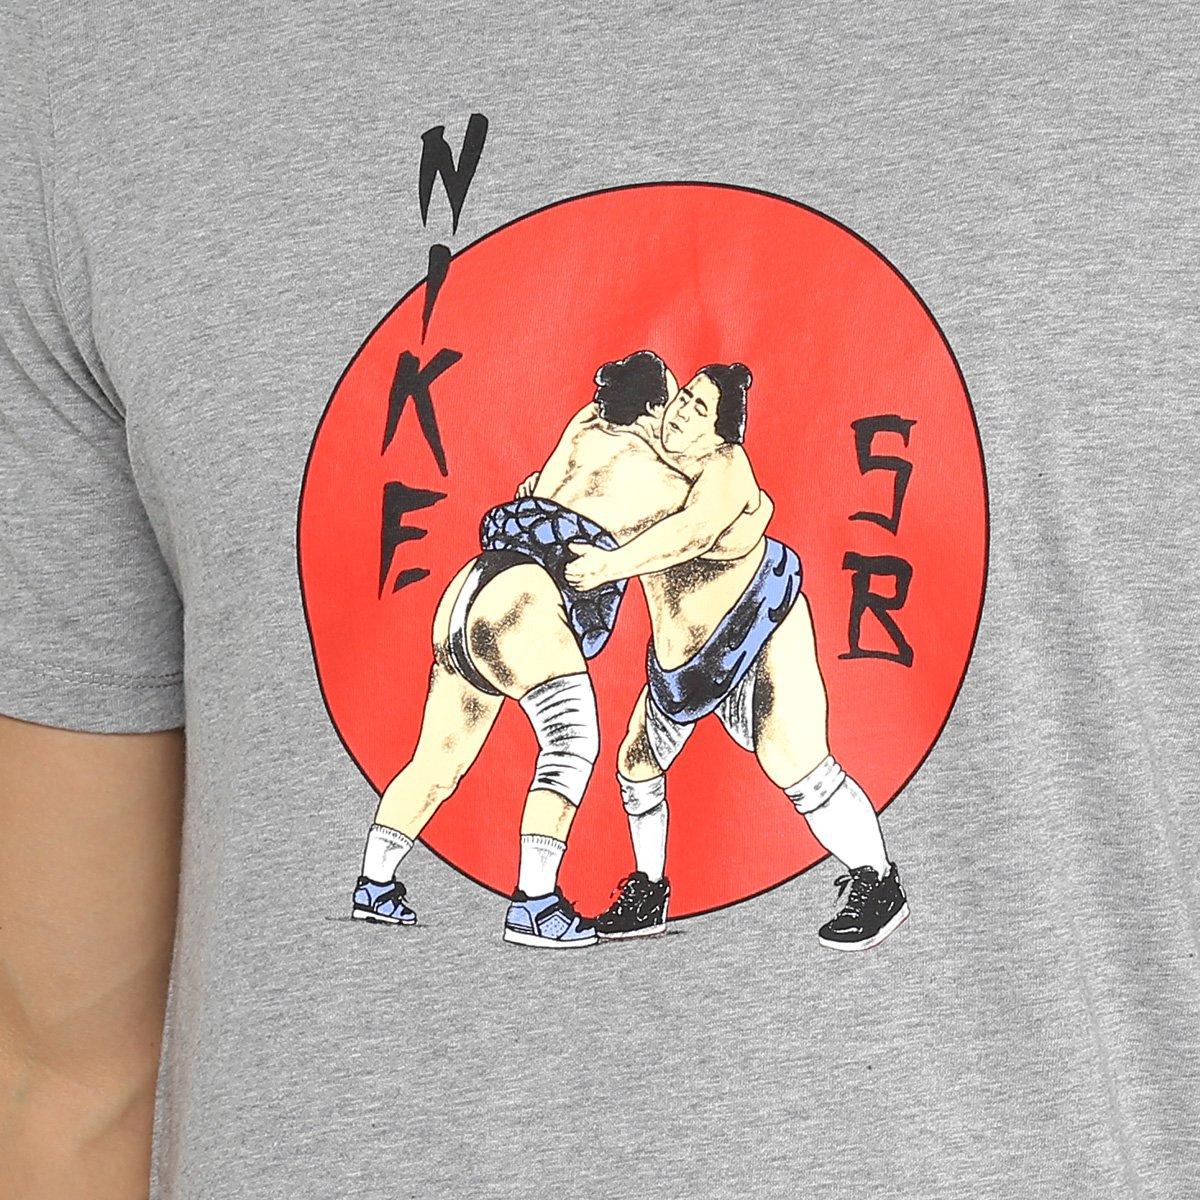 263417a64b Camiseta Nike SB Estampada Tee Wrestler Masculina - Mescla - Compre ...